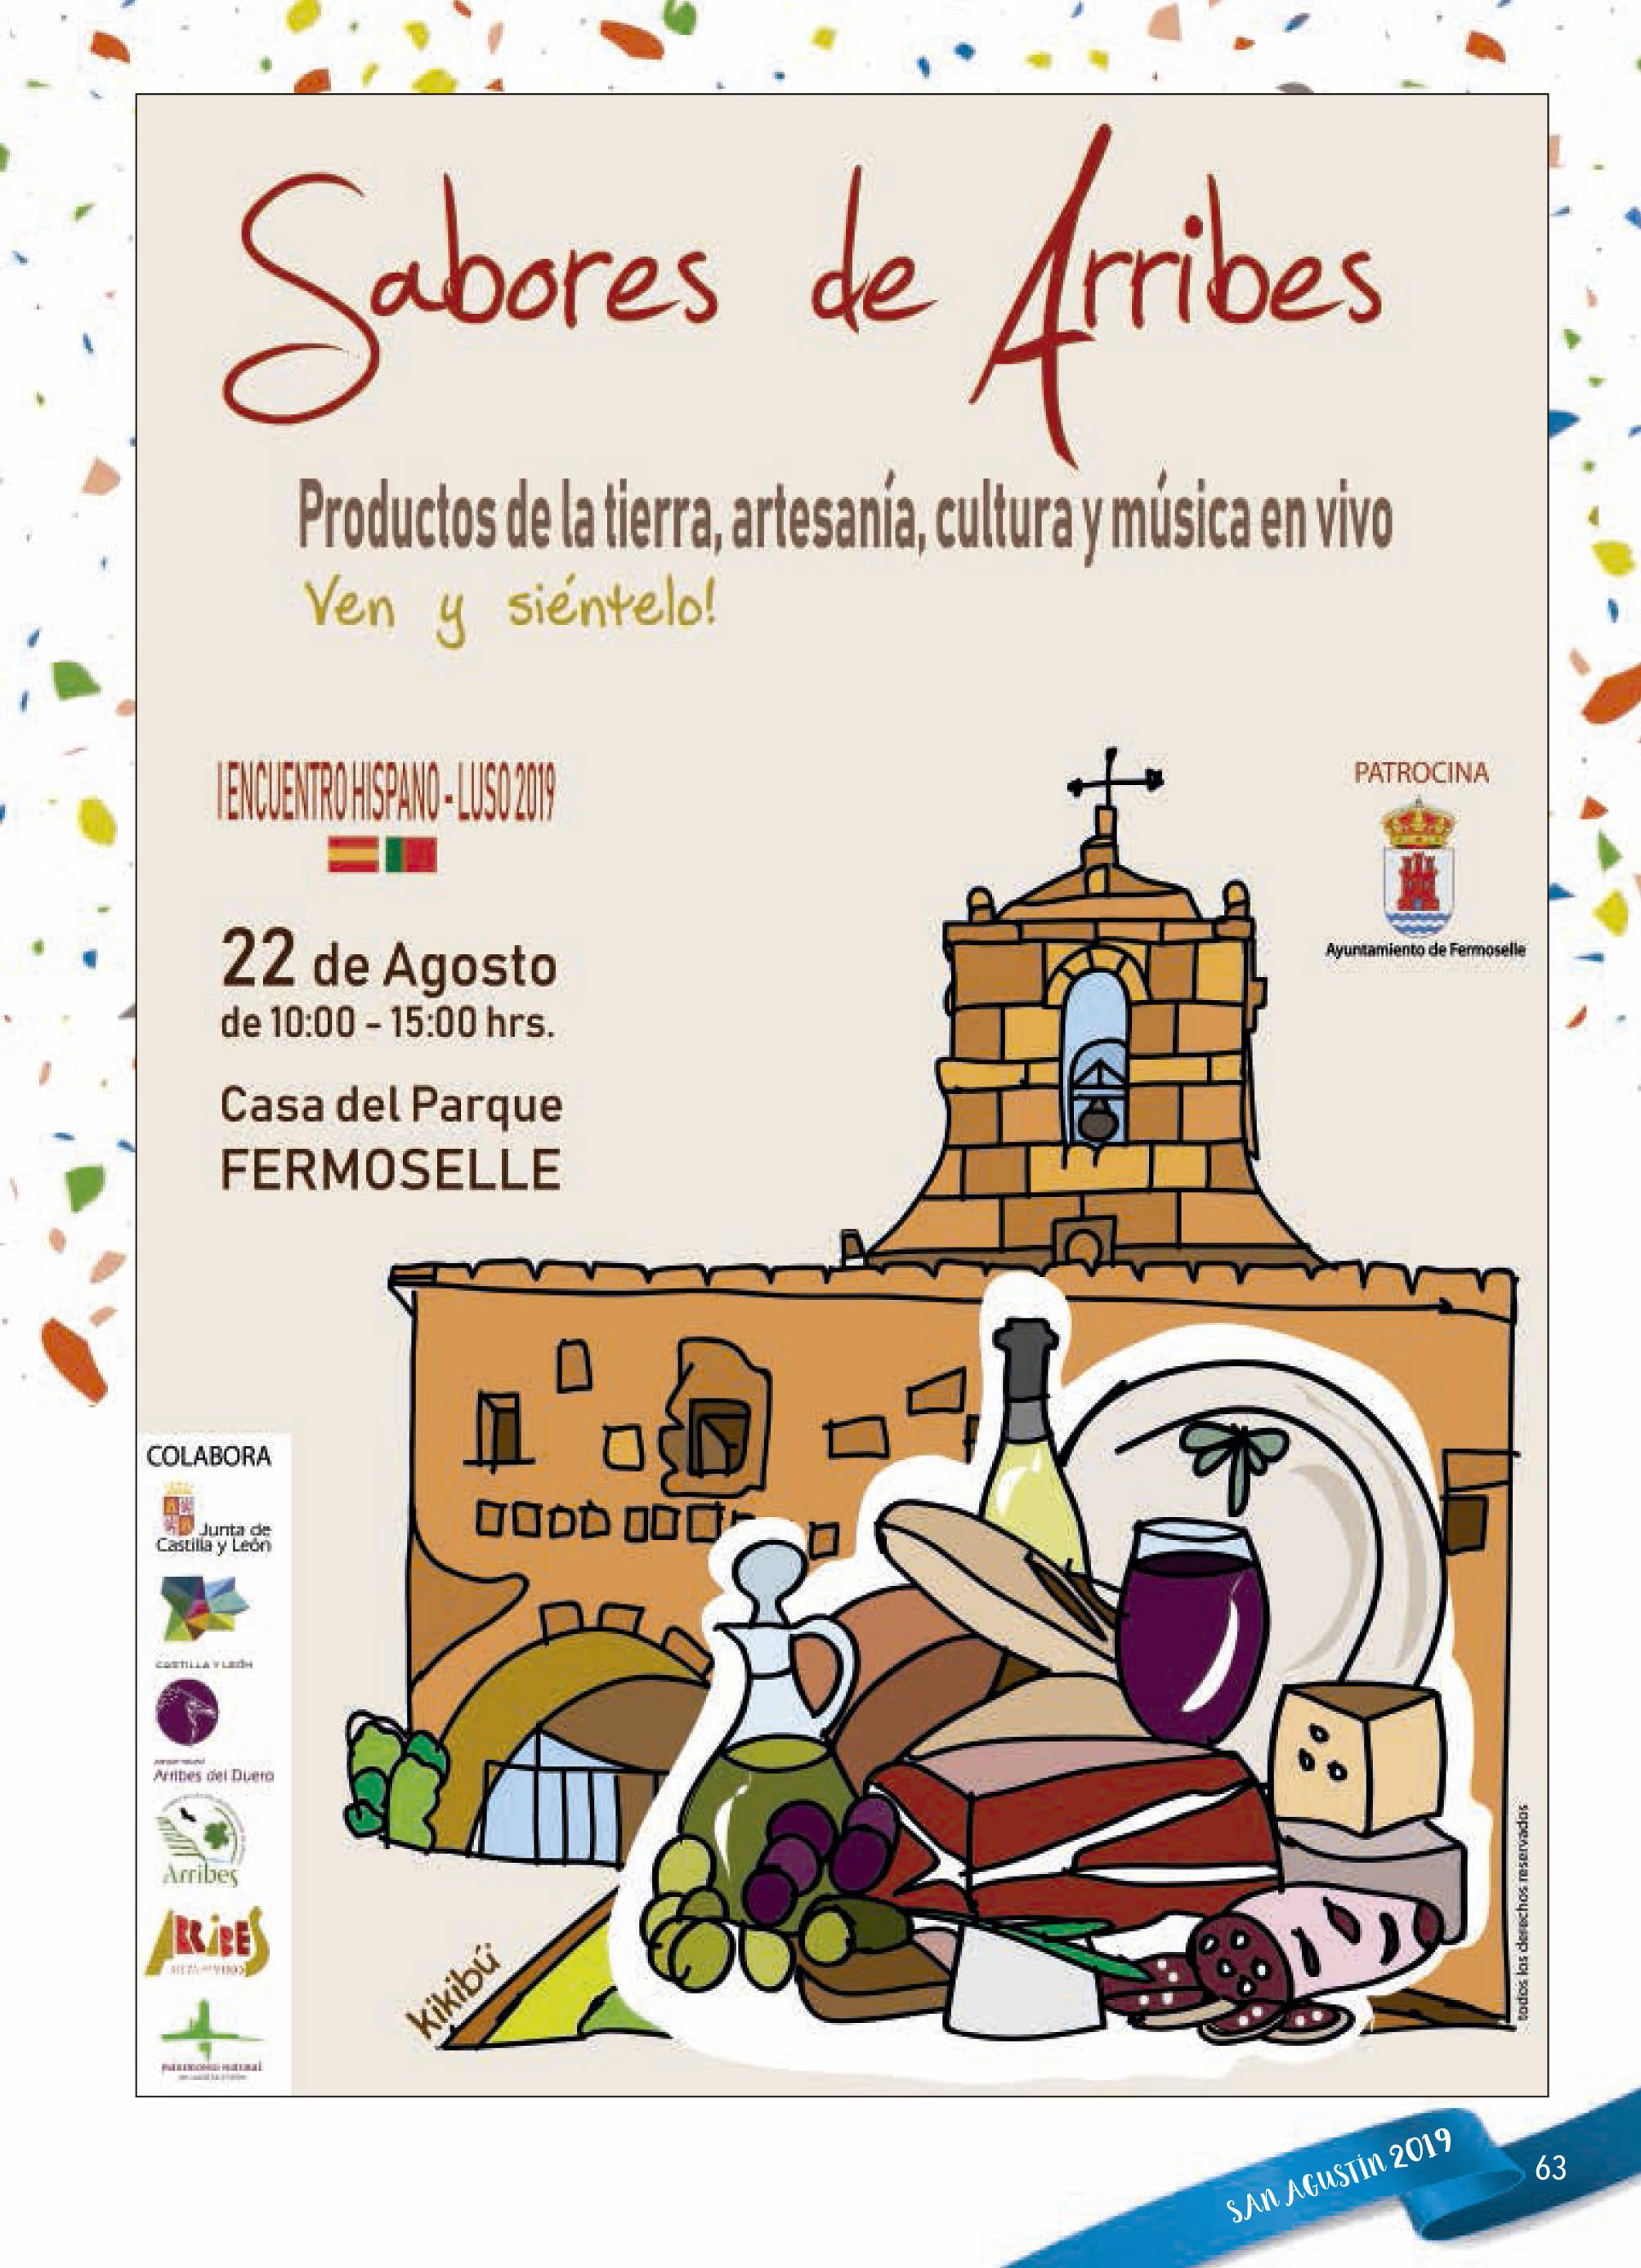 Programa de ferias y fiestas 2019 - Fermoselle (Zamora) 25